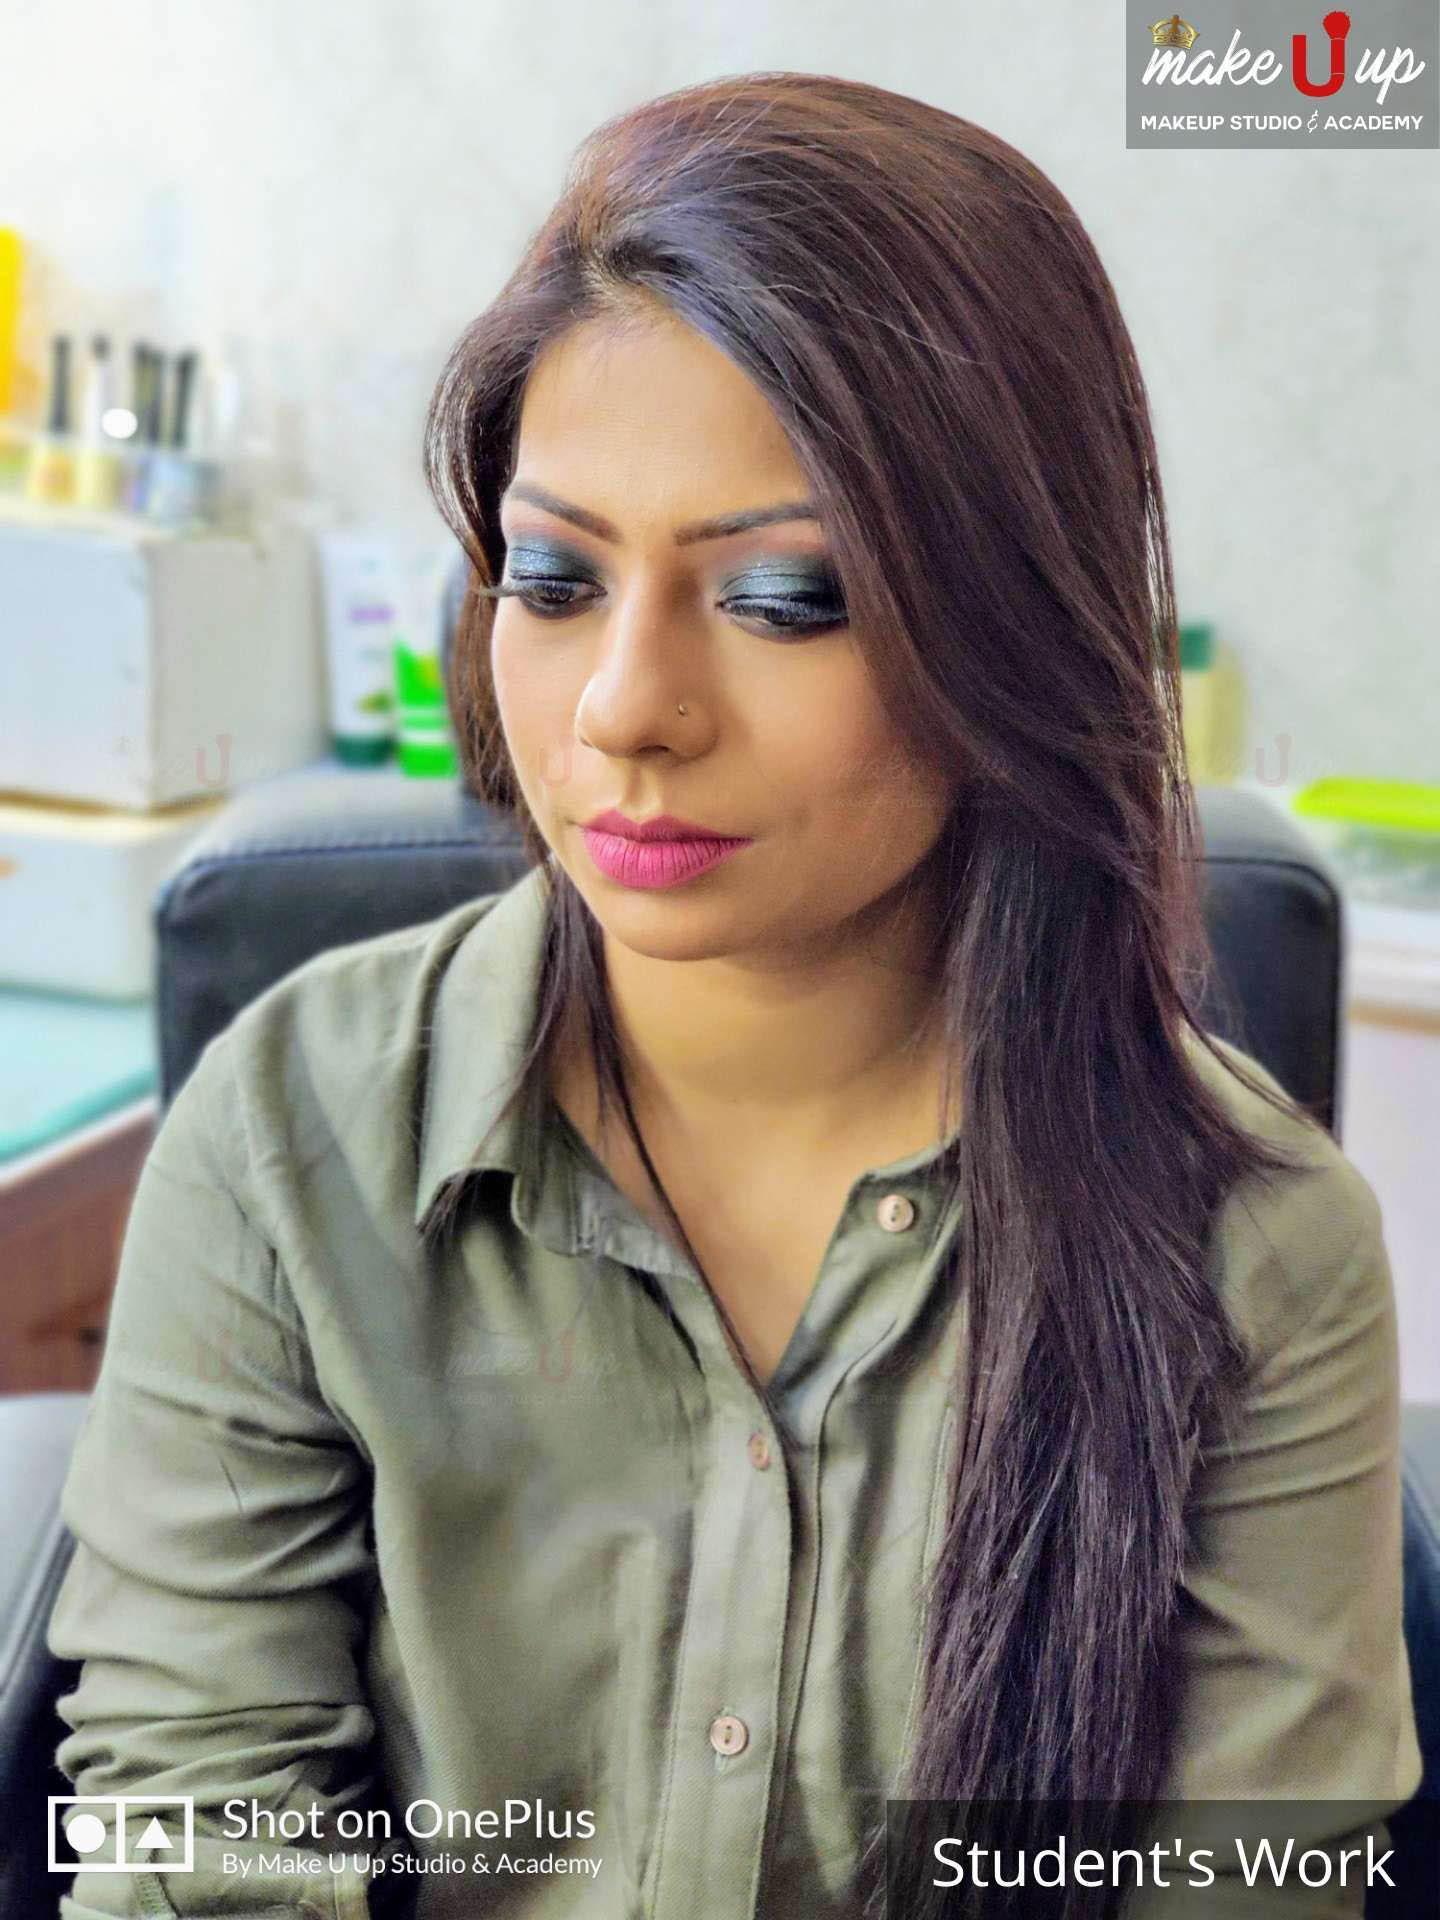 student makeup practice